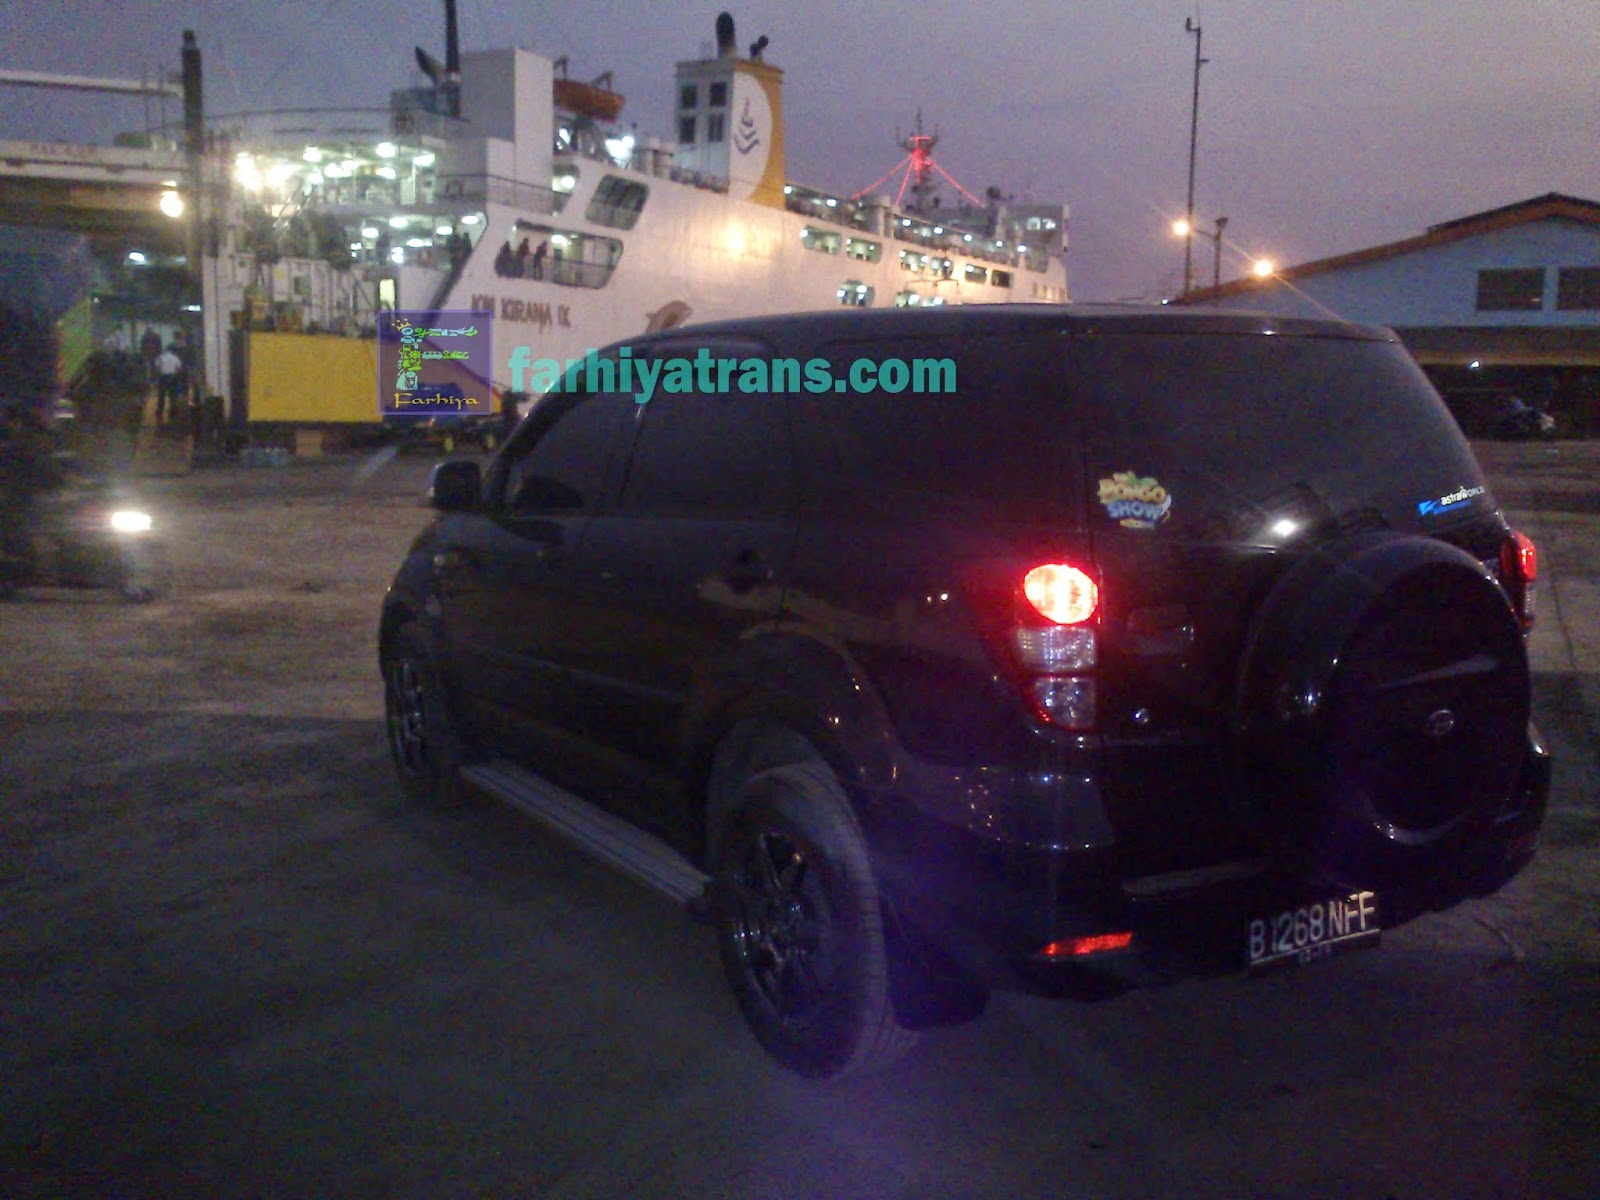 Pengiriman Mobil Daihatsu Terios tujuan Surabaya-Batulicin dengan Kapal Kirana IX